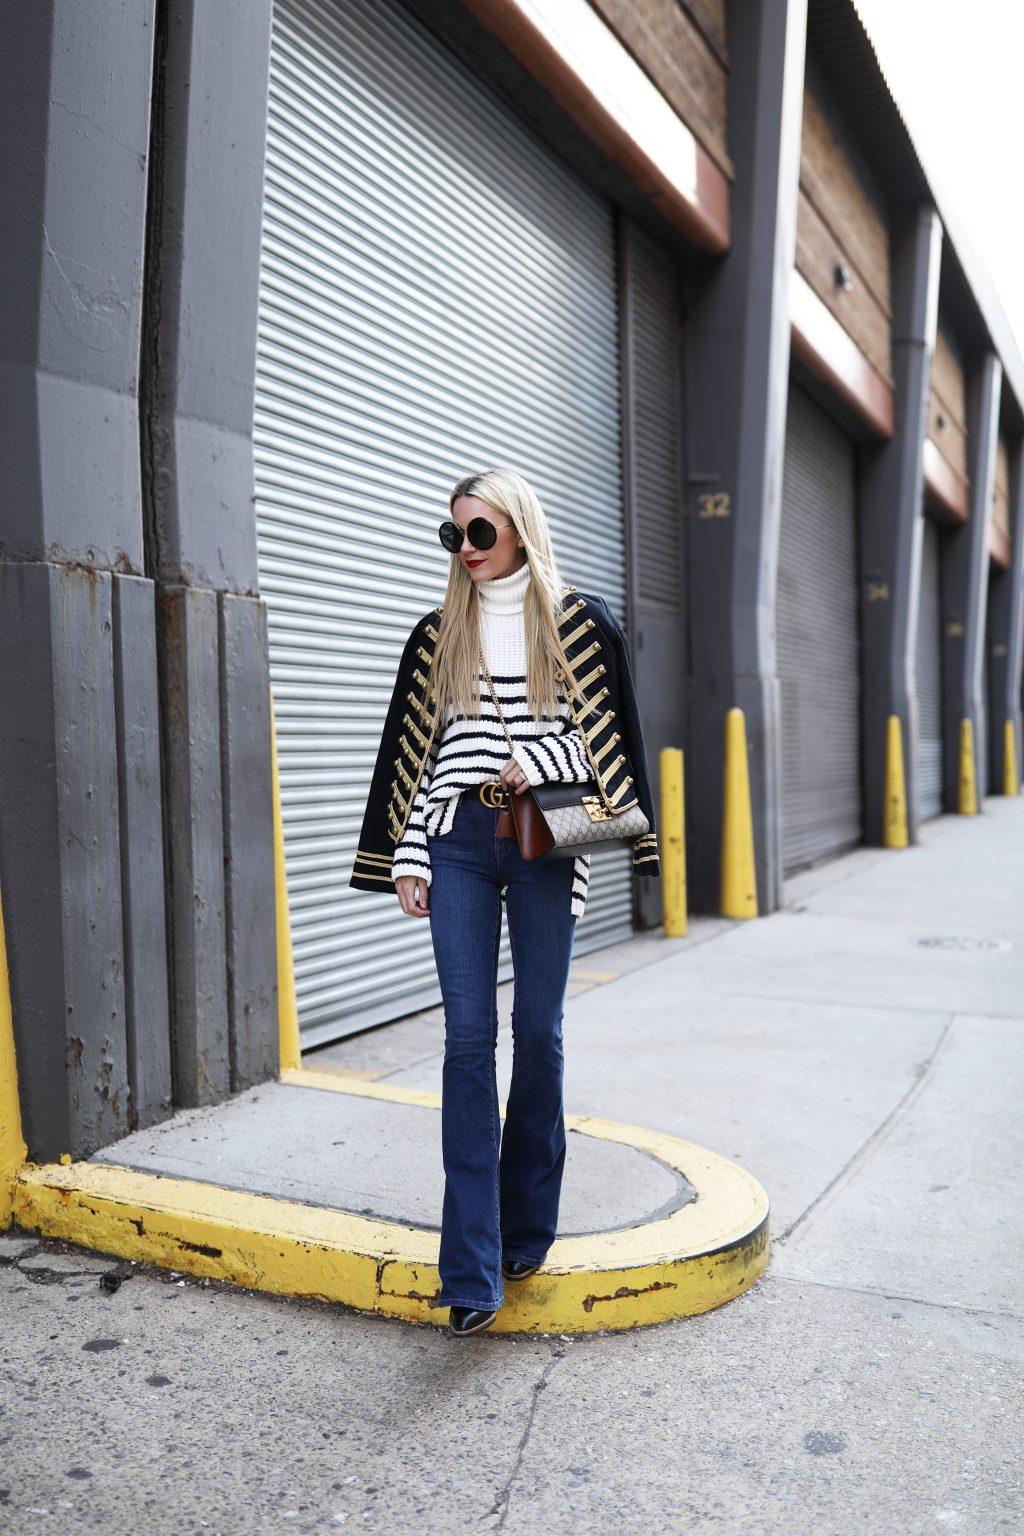 atlantic-pacific-blog-ny-denim-striped-sweater-band-jacket-gold-gucci-bag